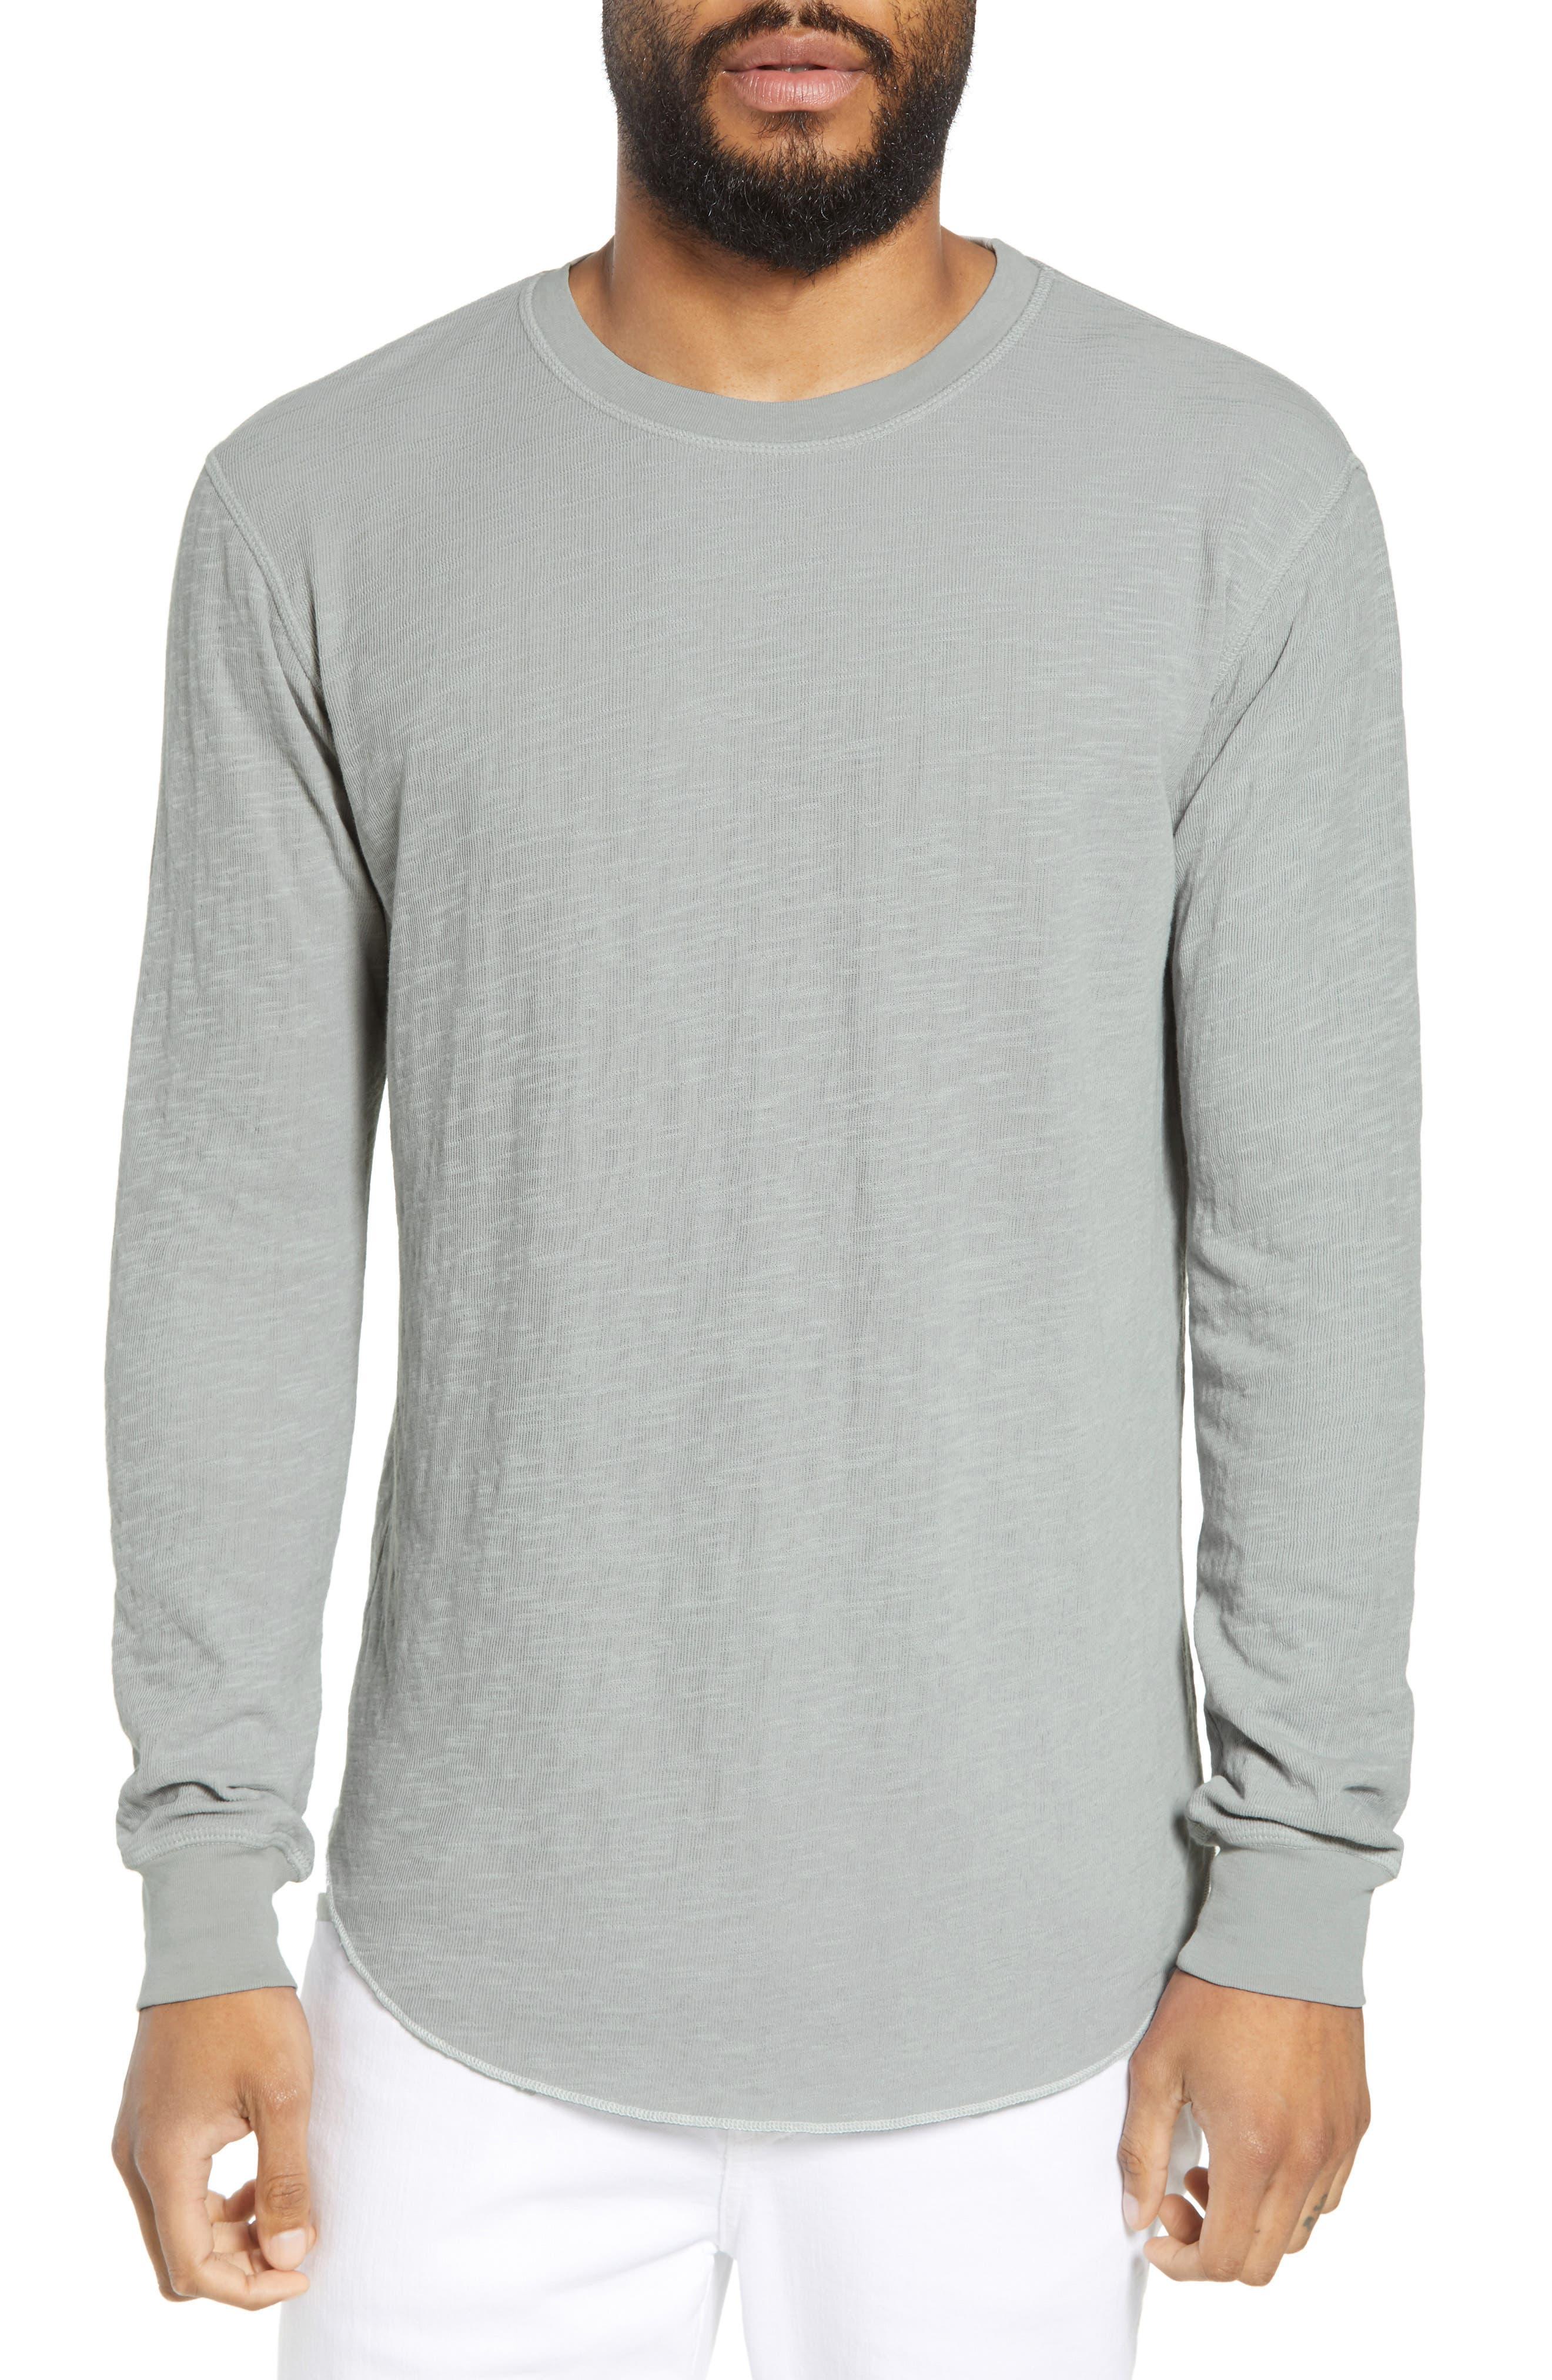 GOODLIFE Double Layer Slim Crewneck T-Shirt, Main, color, QUARRY